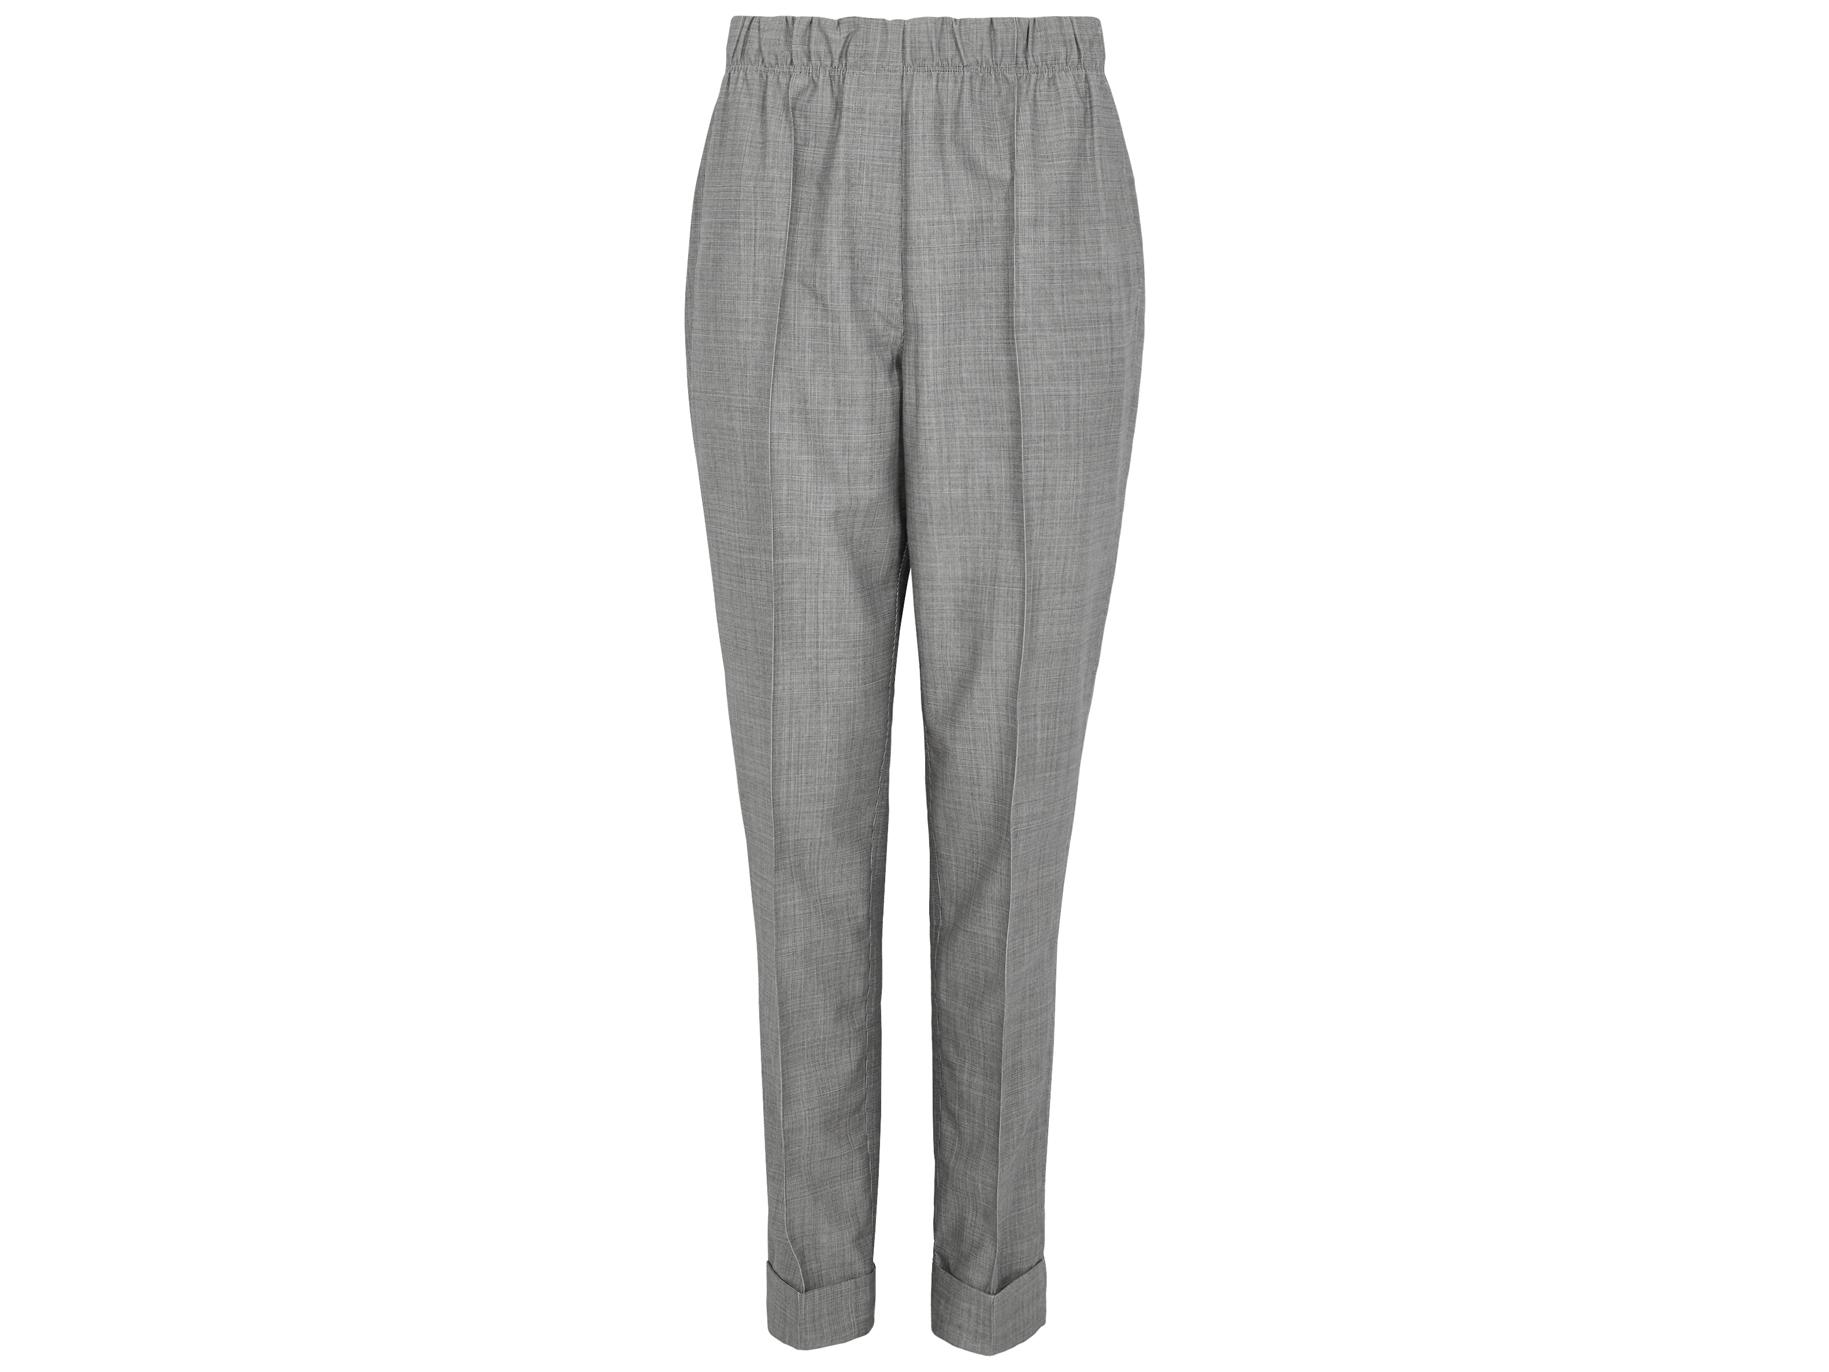 d0d1772b7f86e Helmut Lang Grey wool and mohair-blend trousers - Harvey Nichols